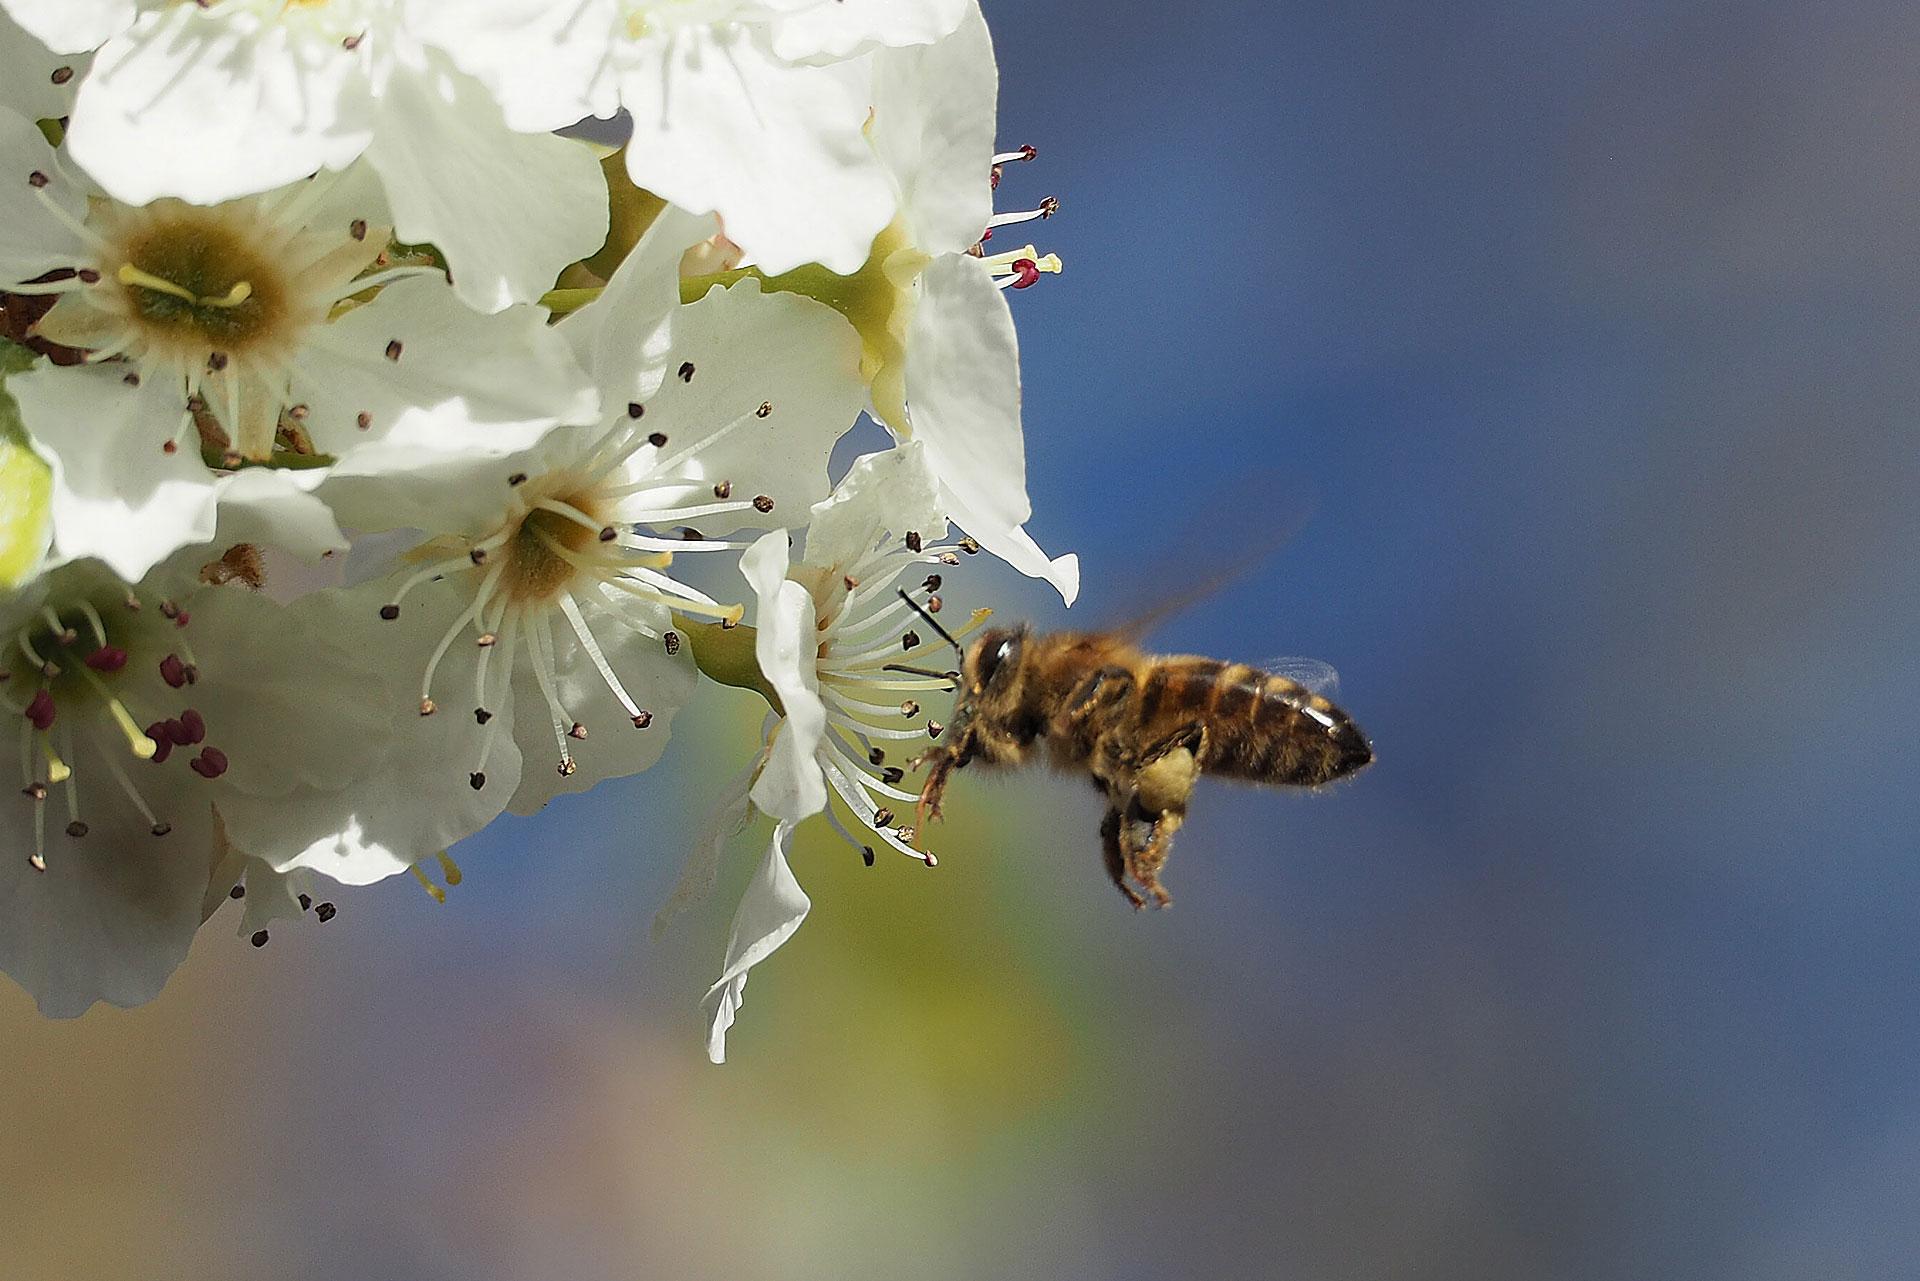 Pollination at Play